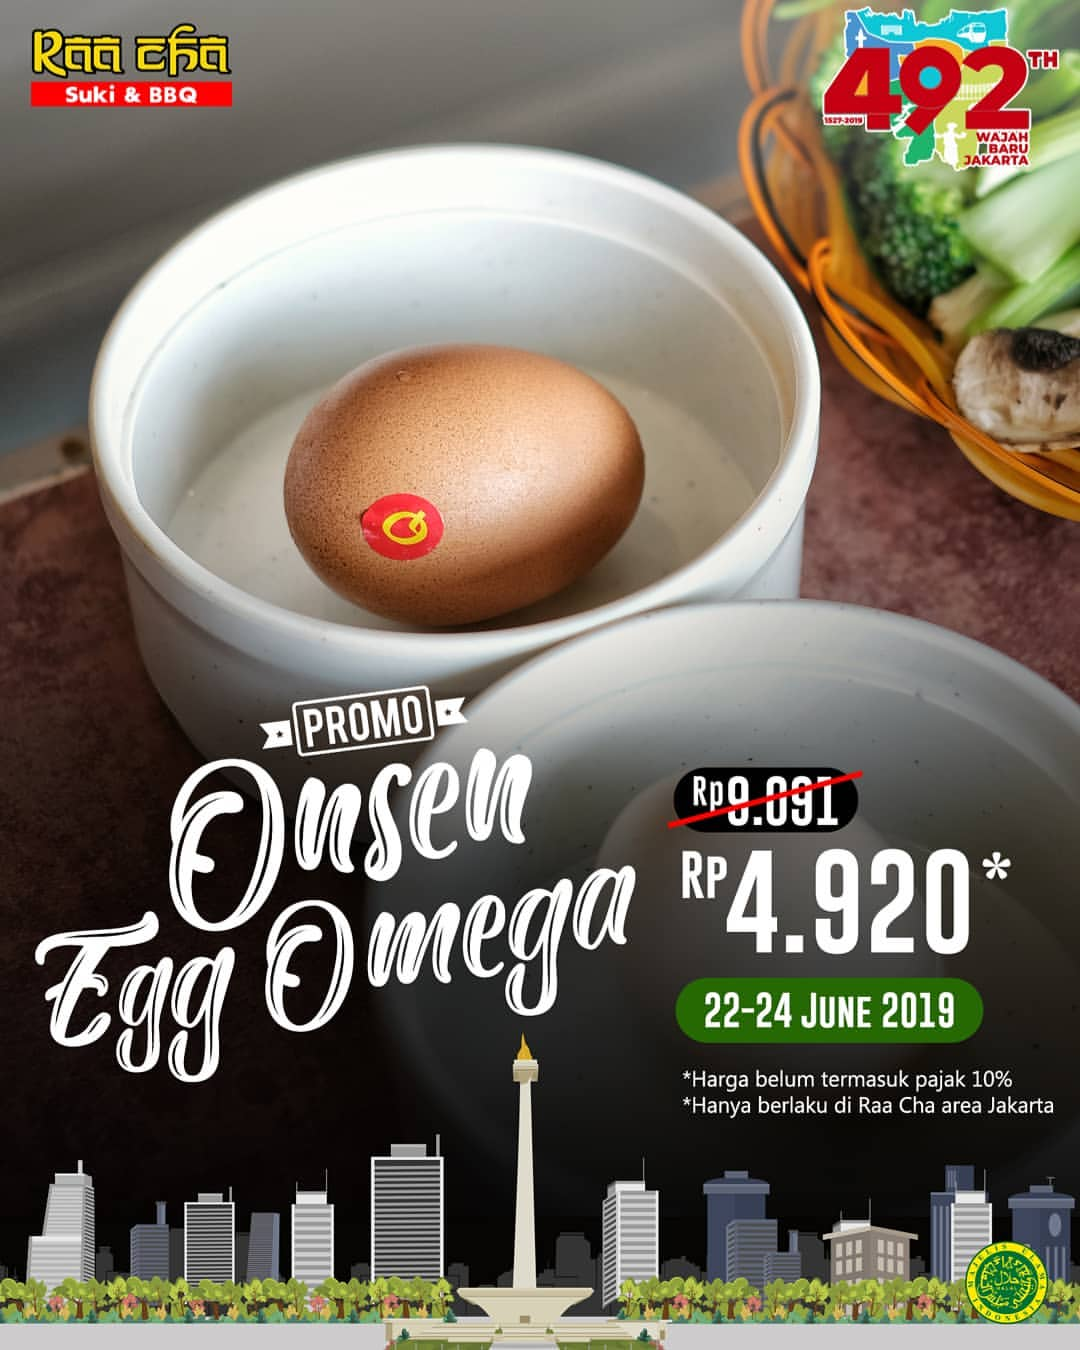 Diskon RAA CHAA Suki & BBQ Promo Harga Spesial Onsen Egg Omega cuma Rp.4.920